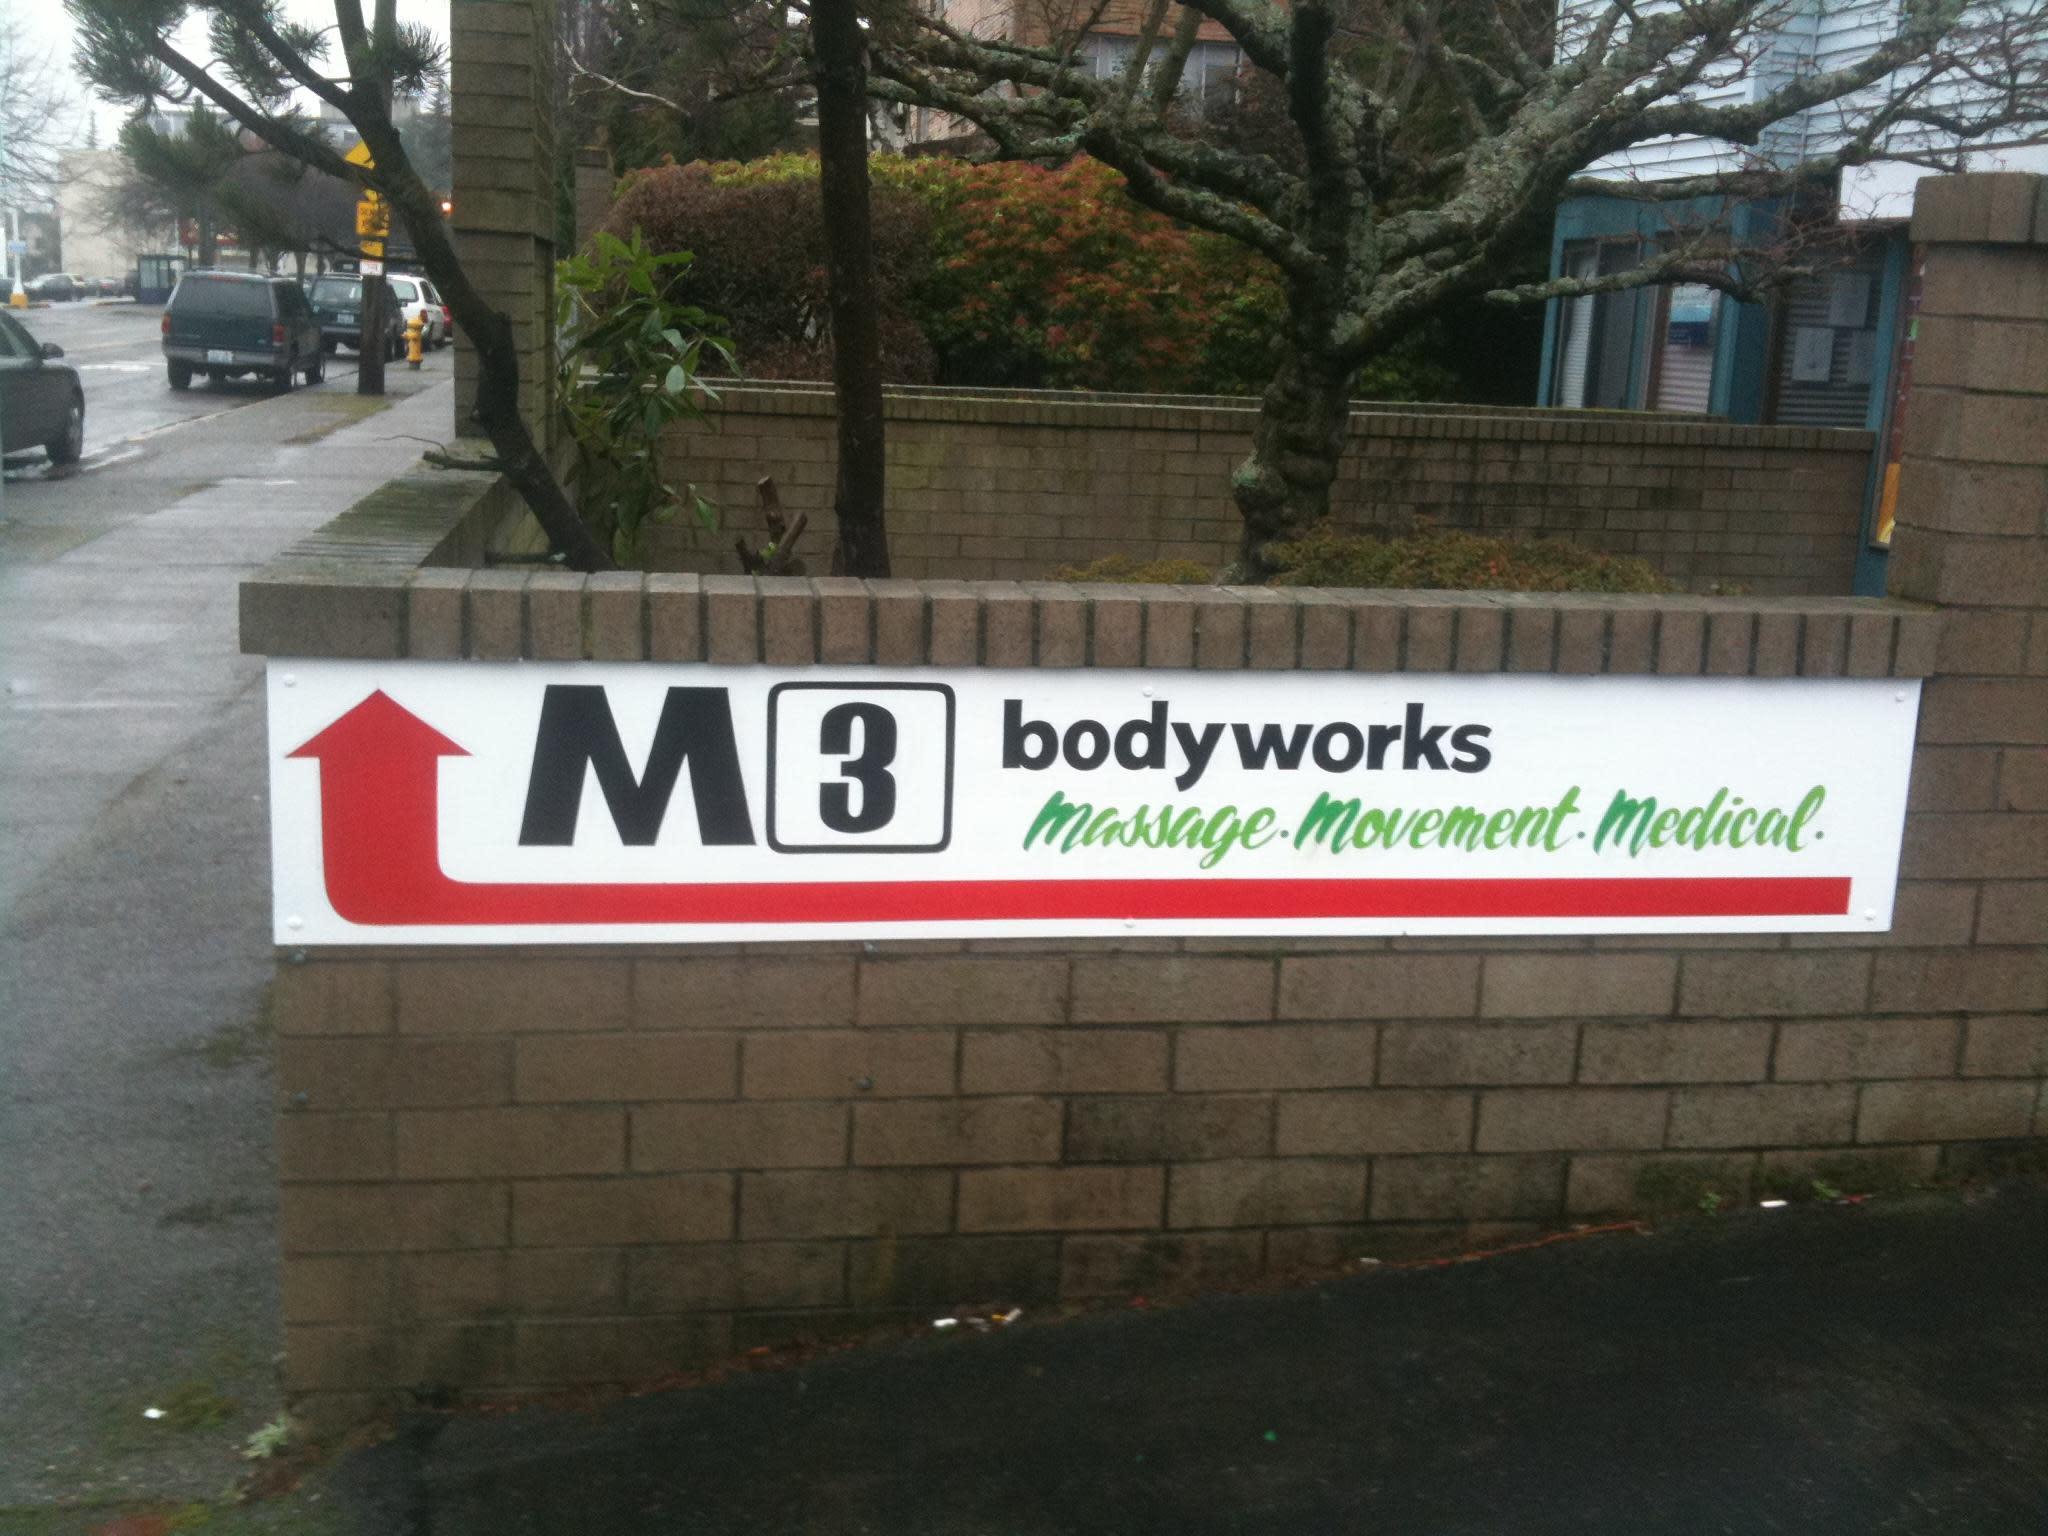 M3 Bodyworks at M3 Bodyworks Massage Clinic